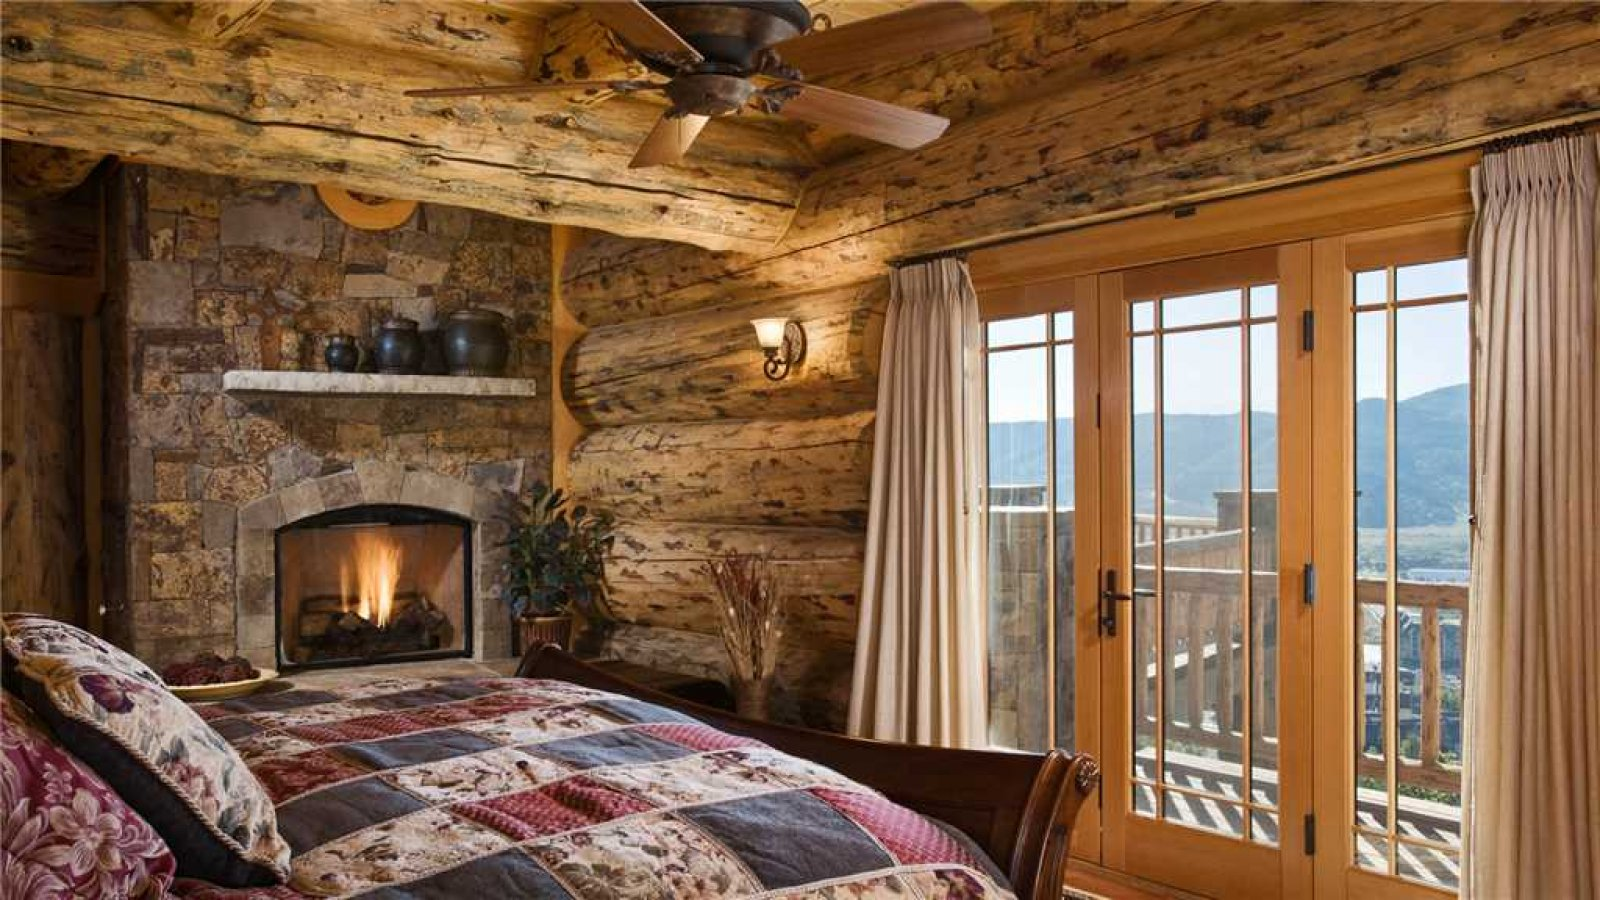 See Me Lodge Steamboat Springs Vacation Villa